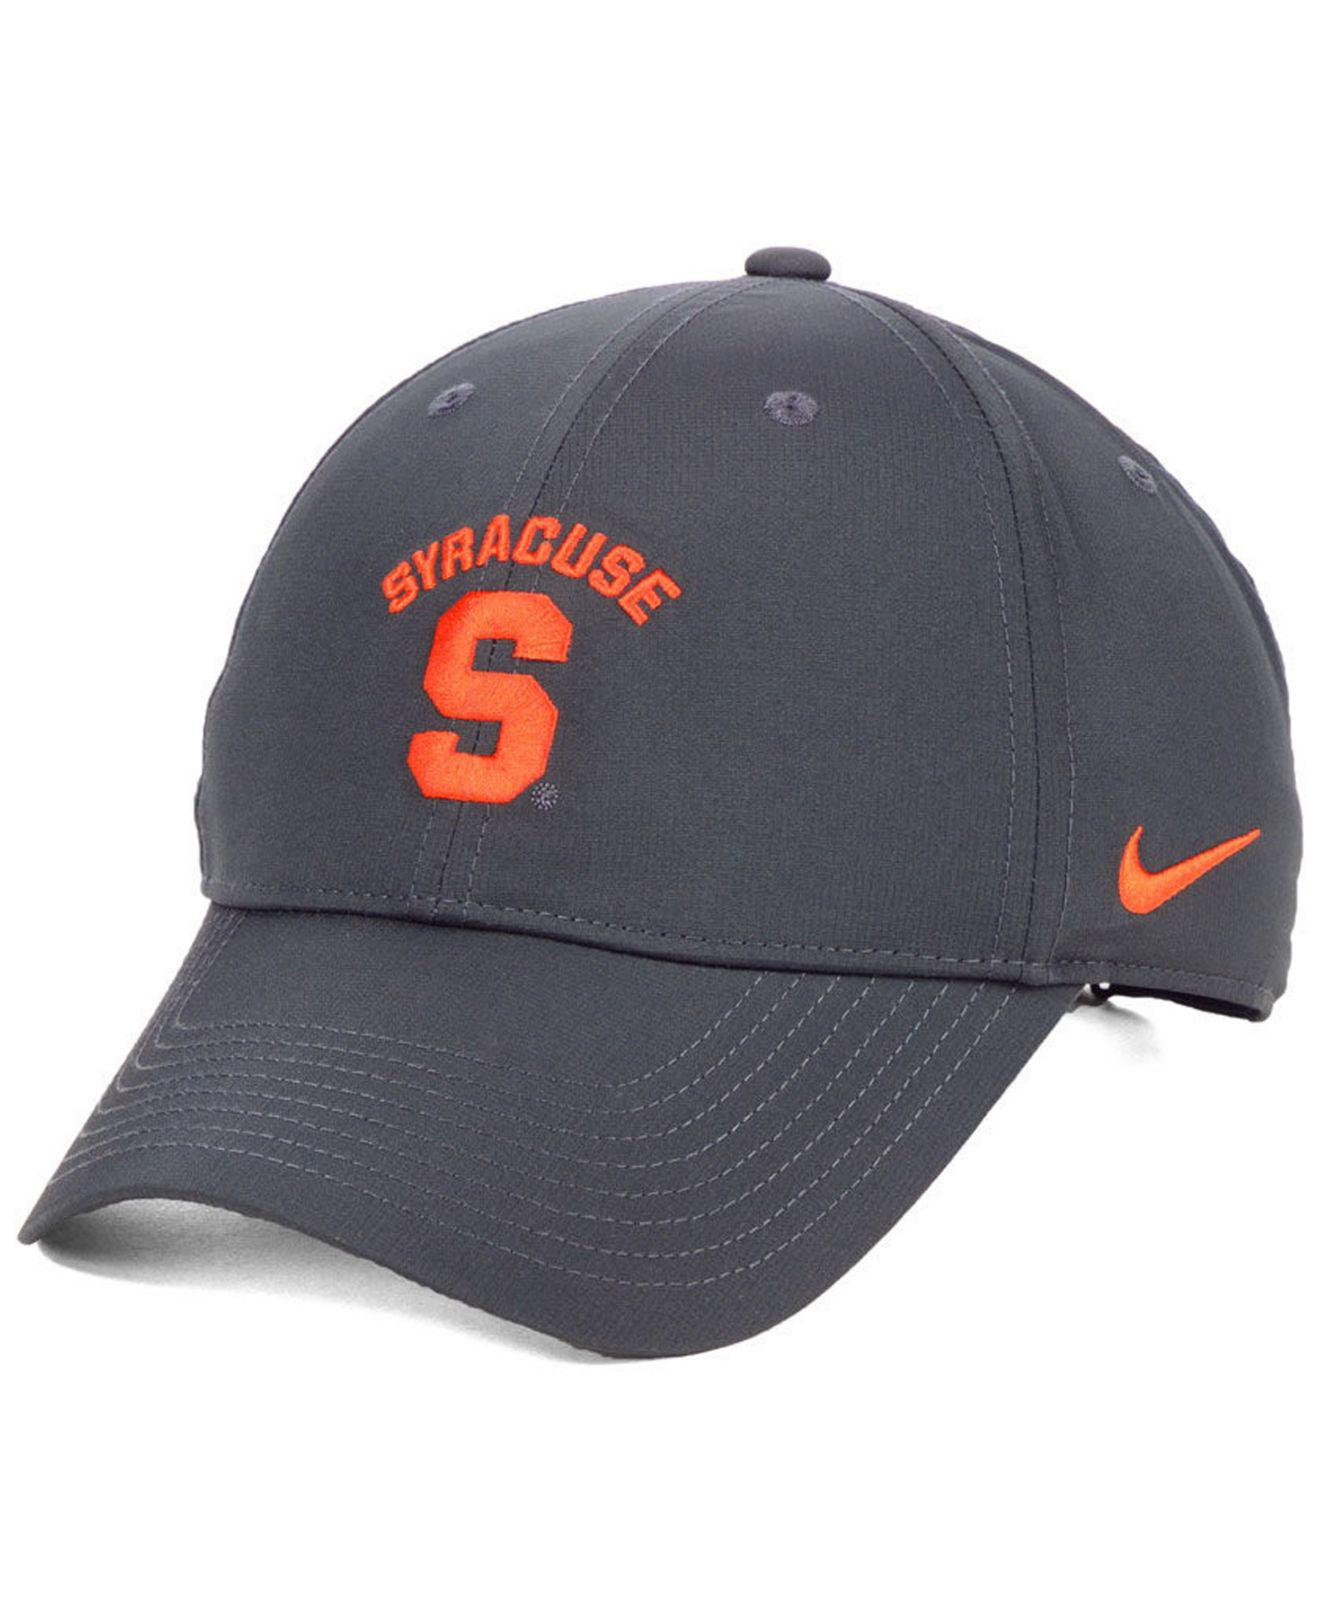 best loved 7c67f 9bbe6 Nike Syracuse Orange Dri-fit Adjustable Cap in Gray for Men - Lyst